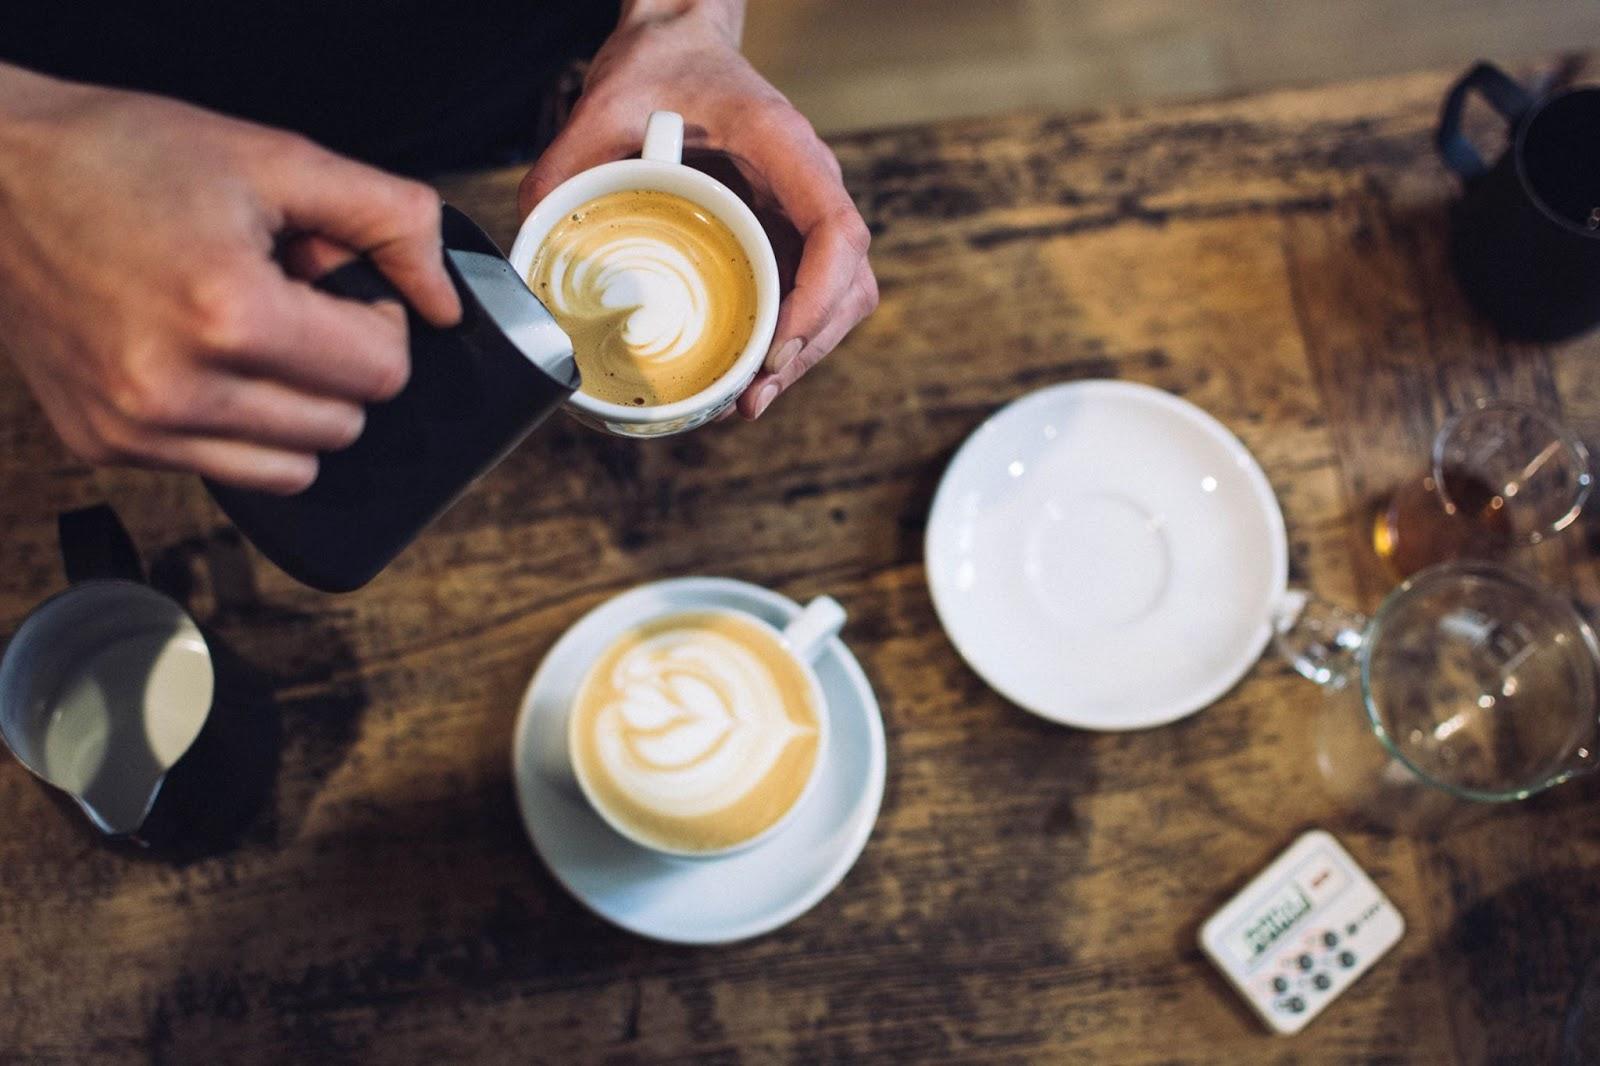 nejlepší kavárny Praha